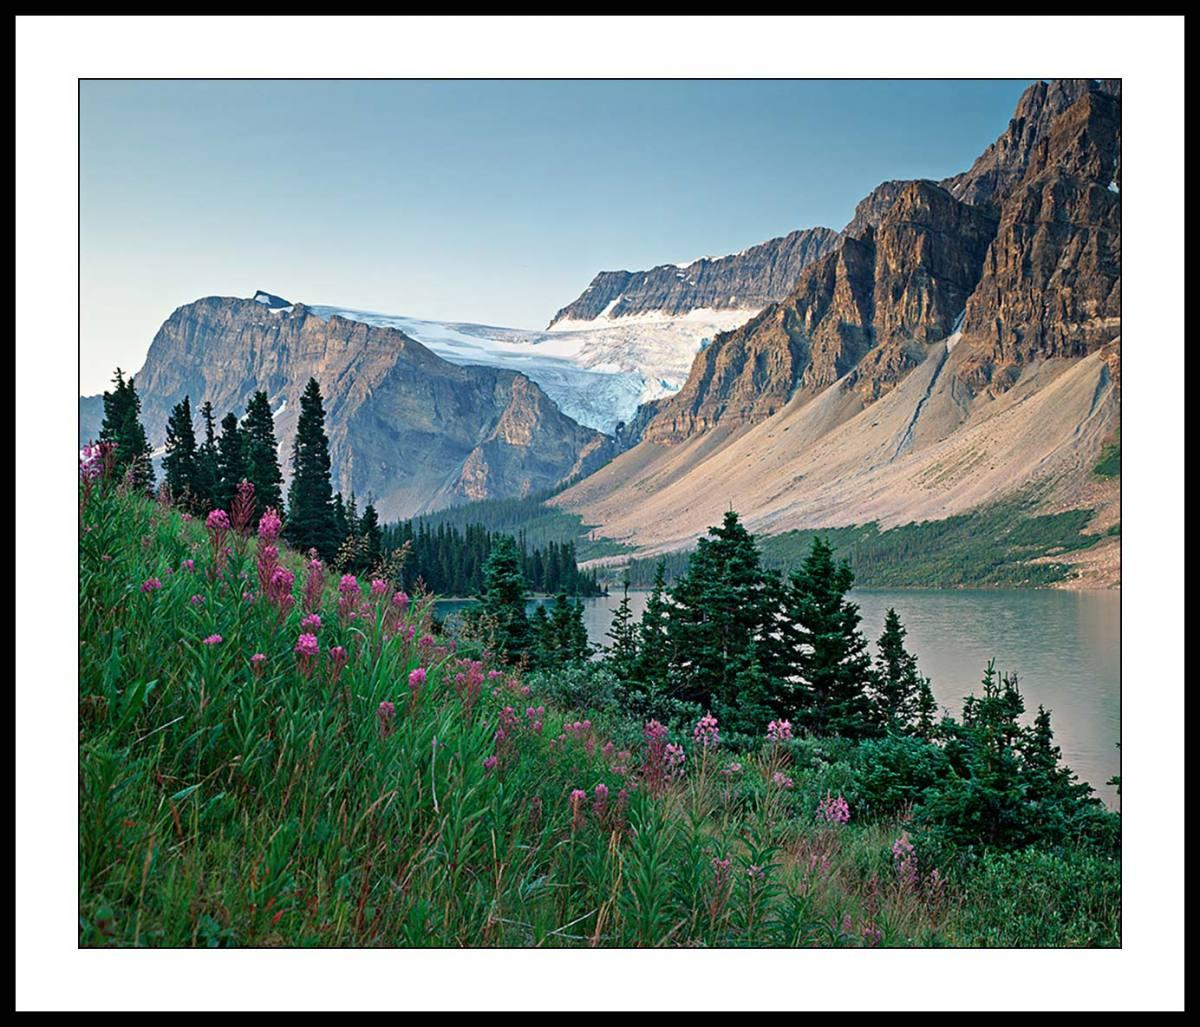 Glacier View from Banff Jasper Highway - British Columbia, Canada